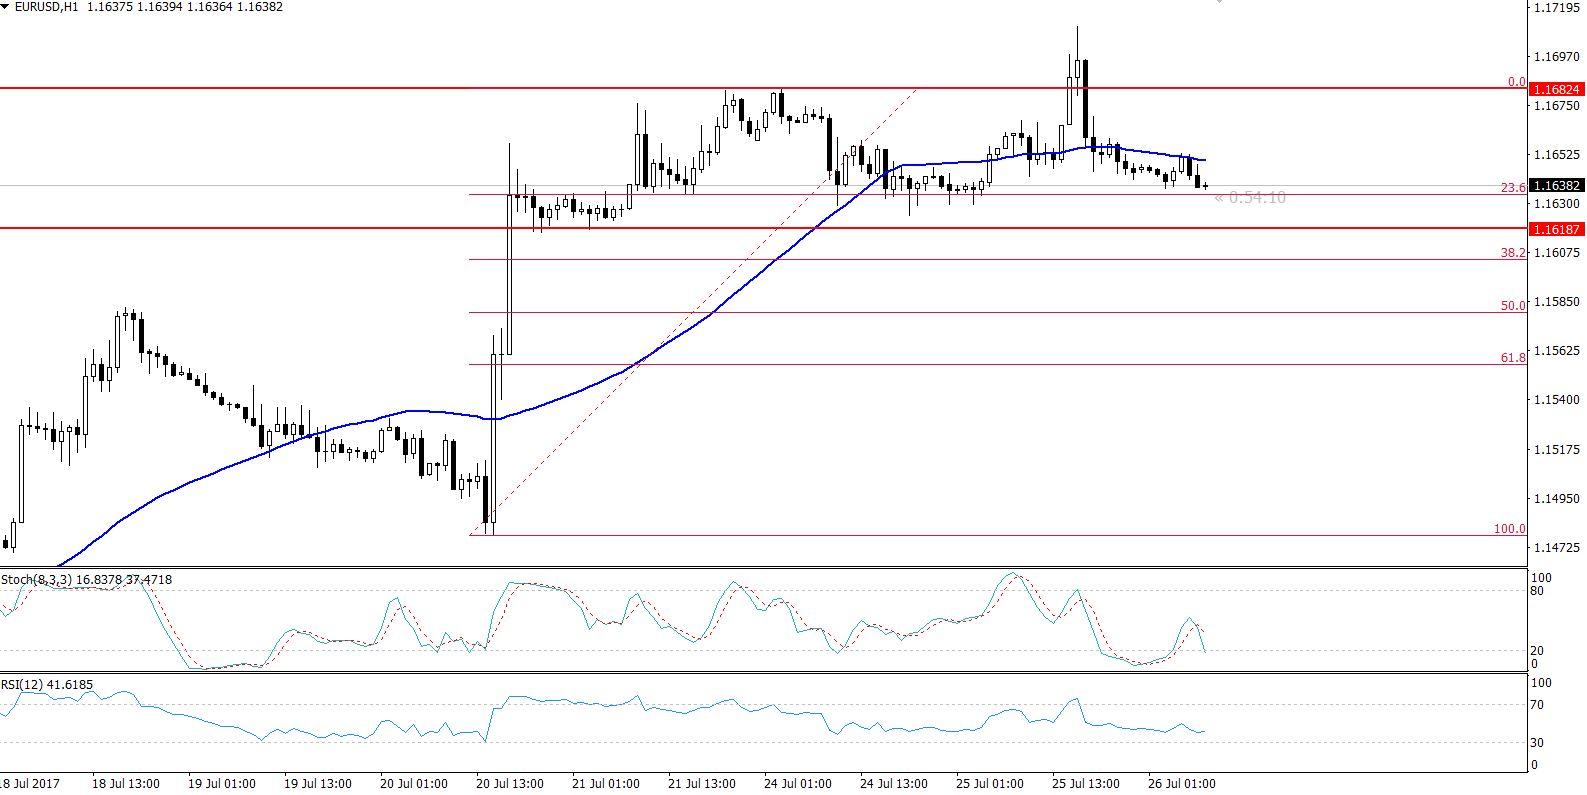 EURUSD - Hourly Chart - Trading Range